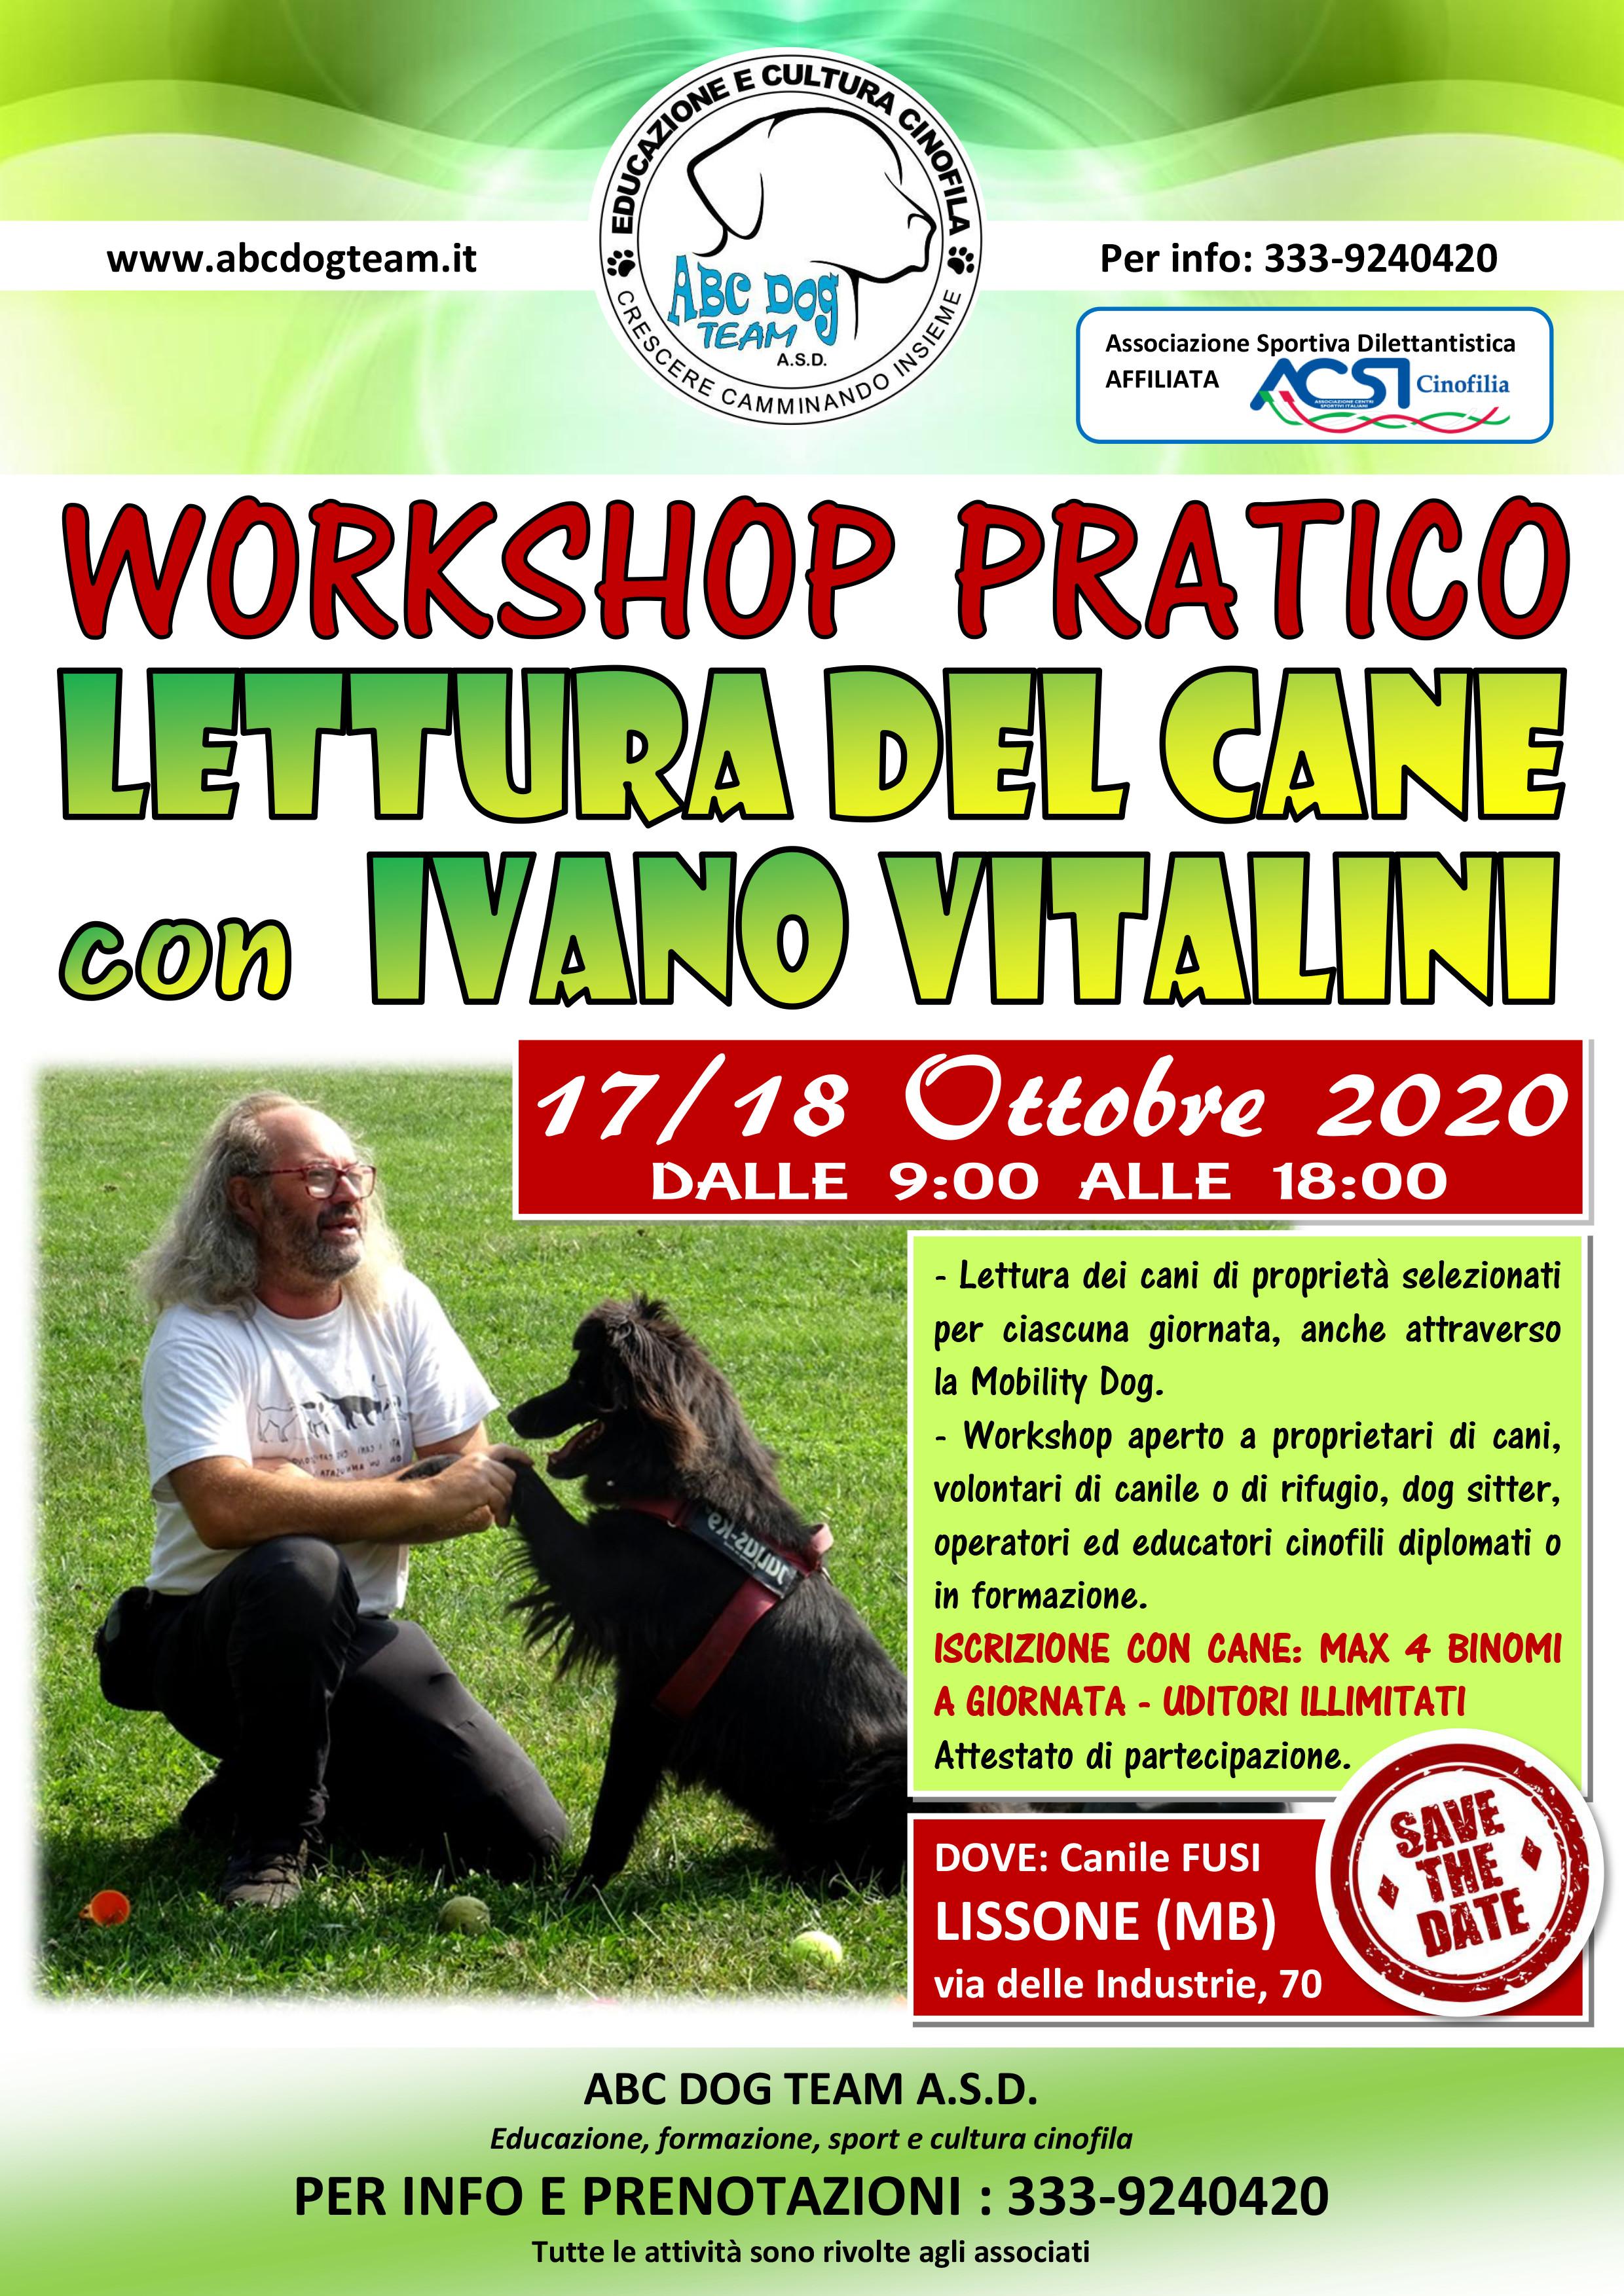 ABC DOG TEAM ASD LETTURA CANI 2020 IVANO VITALINI MONZA